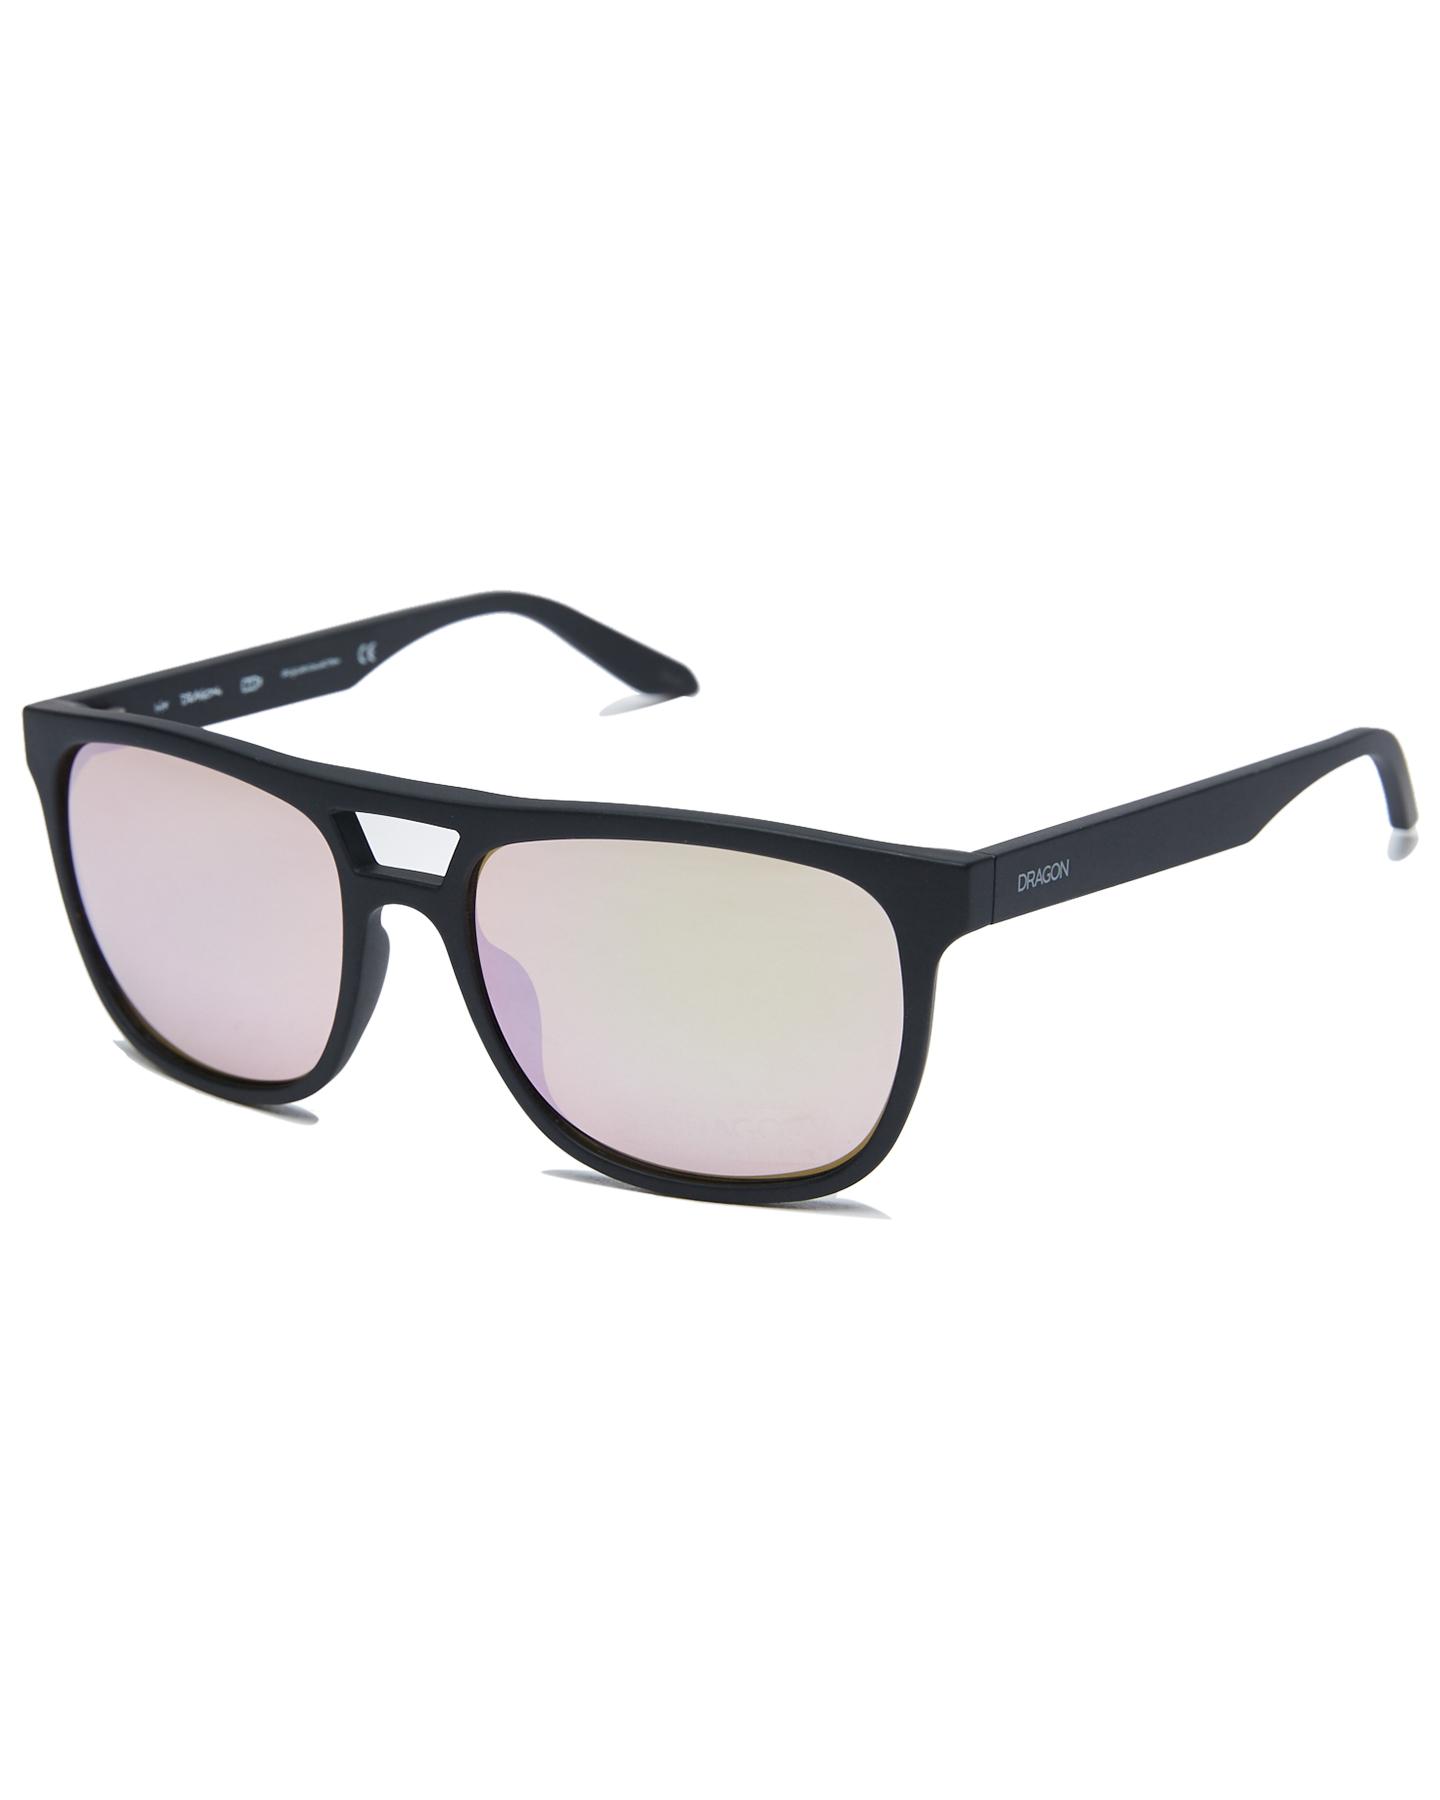 Dragon Cove Sunglasses Matte Black Rg Ion